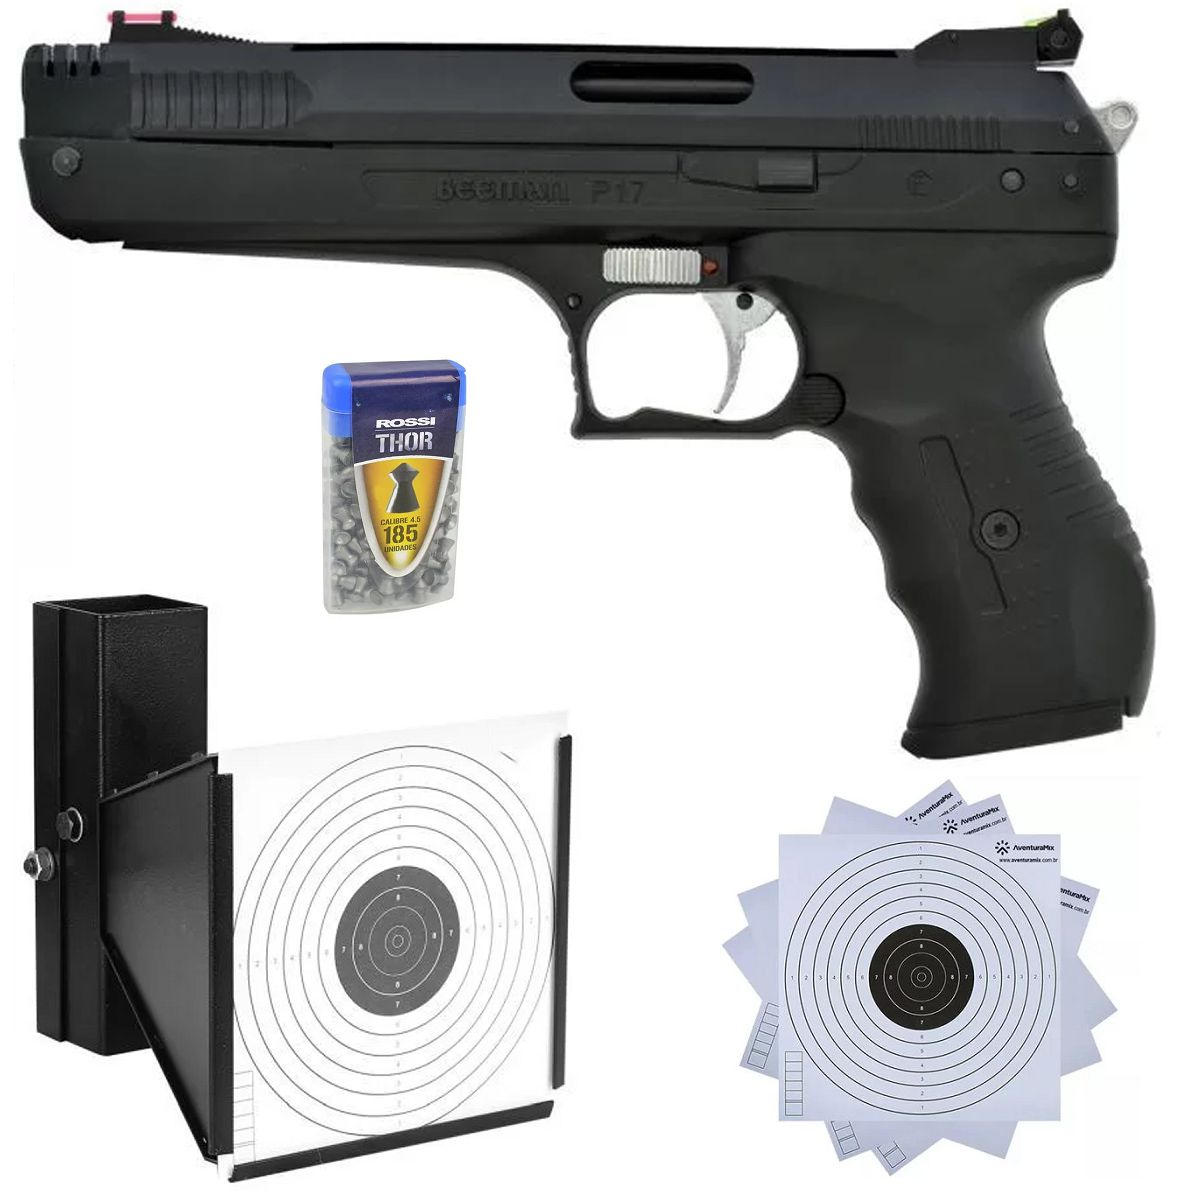 Pistola de Pressão Beeman 2004 P17 4.5mm + Capa Rossi + Alvos de Papel + Chumbinhos + Alvo Coletor